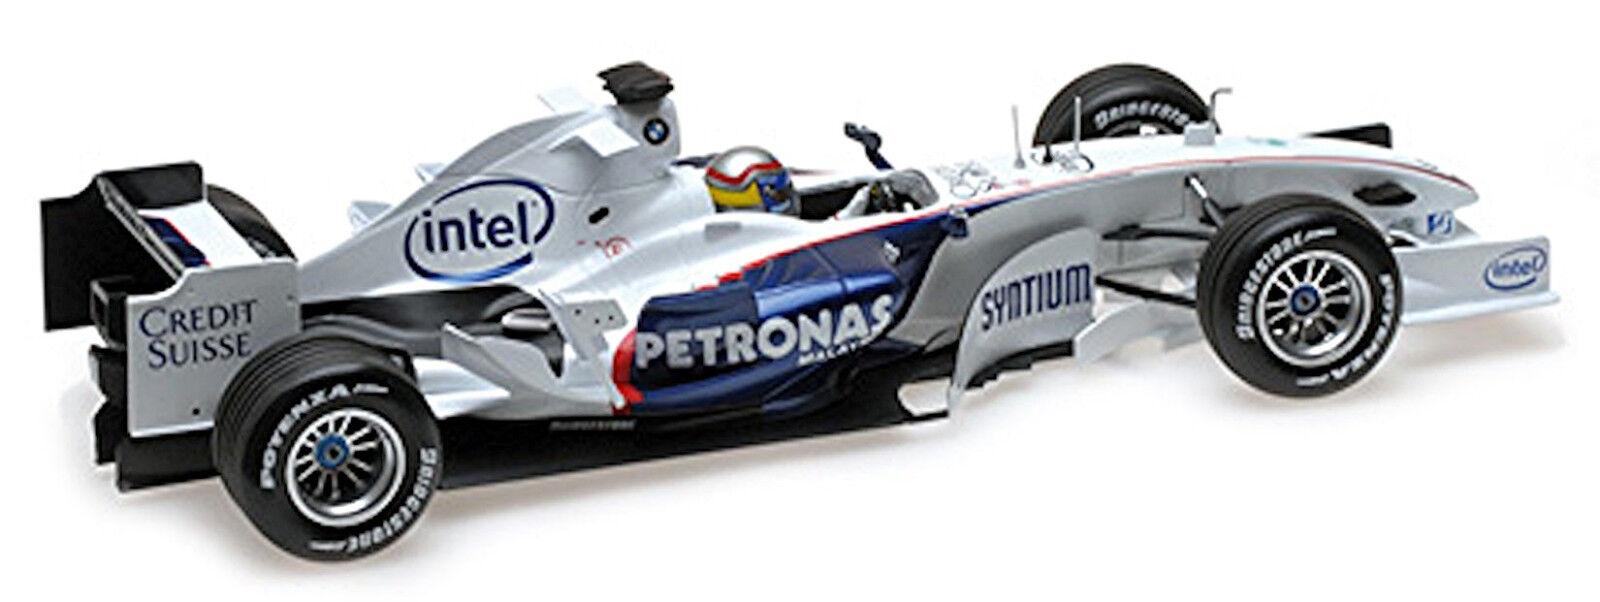 Propre BMW c24b Formula 1 Valence 2006 N. Heidfeld 1 18 Minichamps L.E. 180 PC